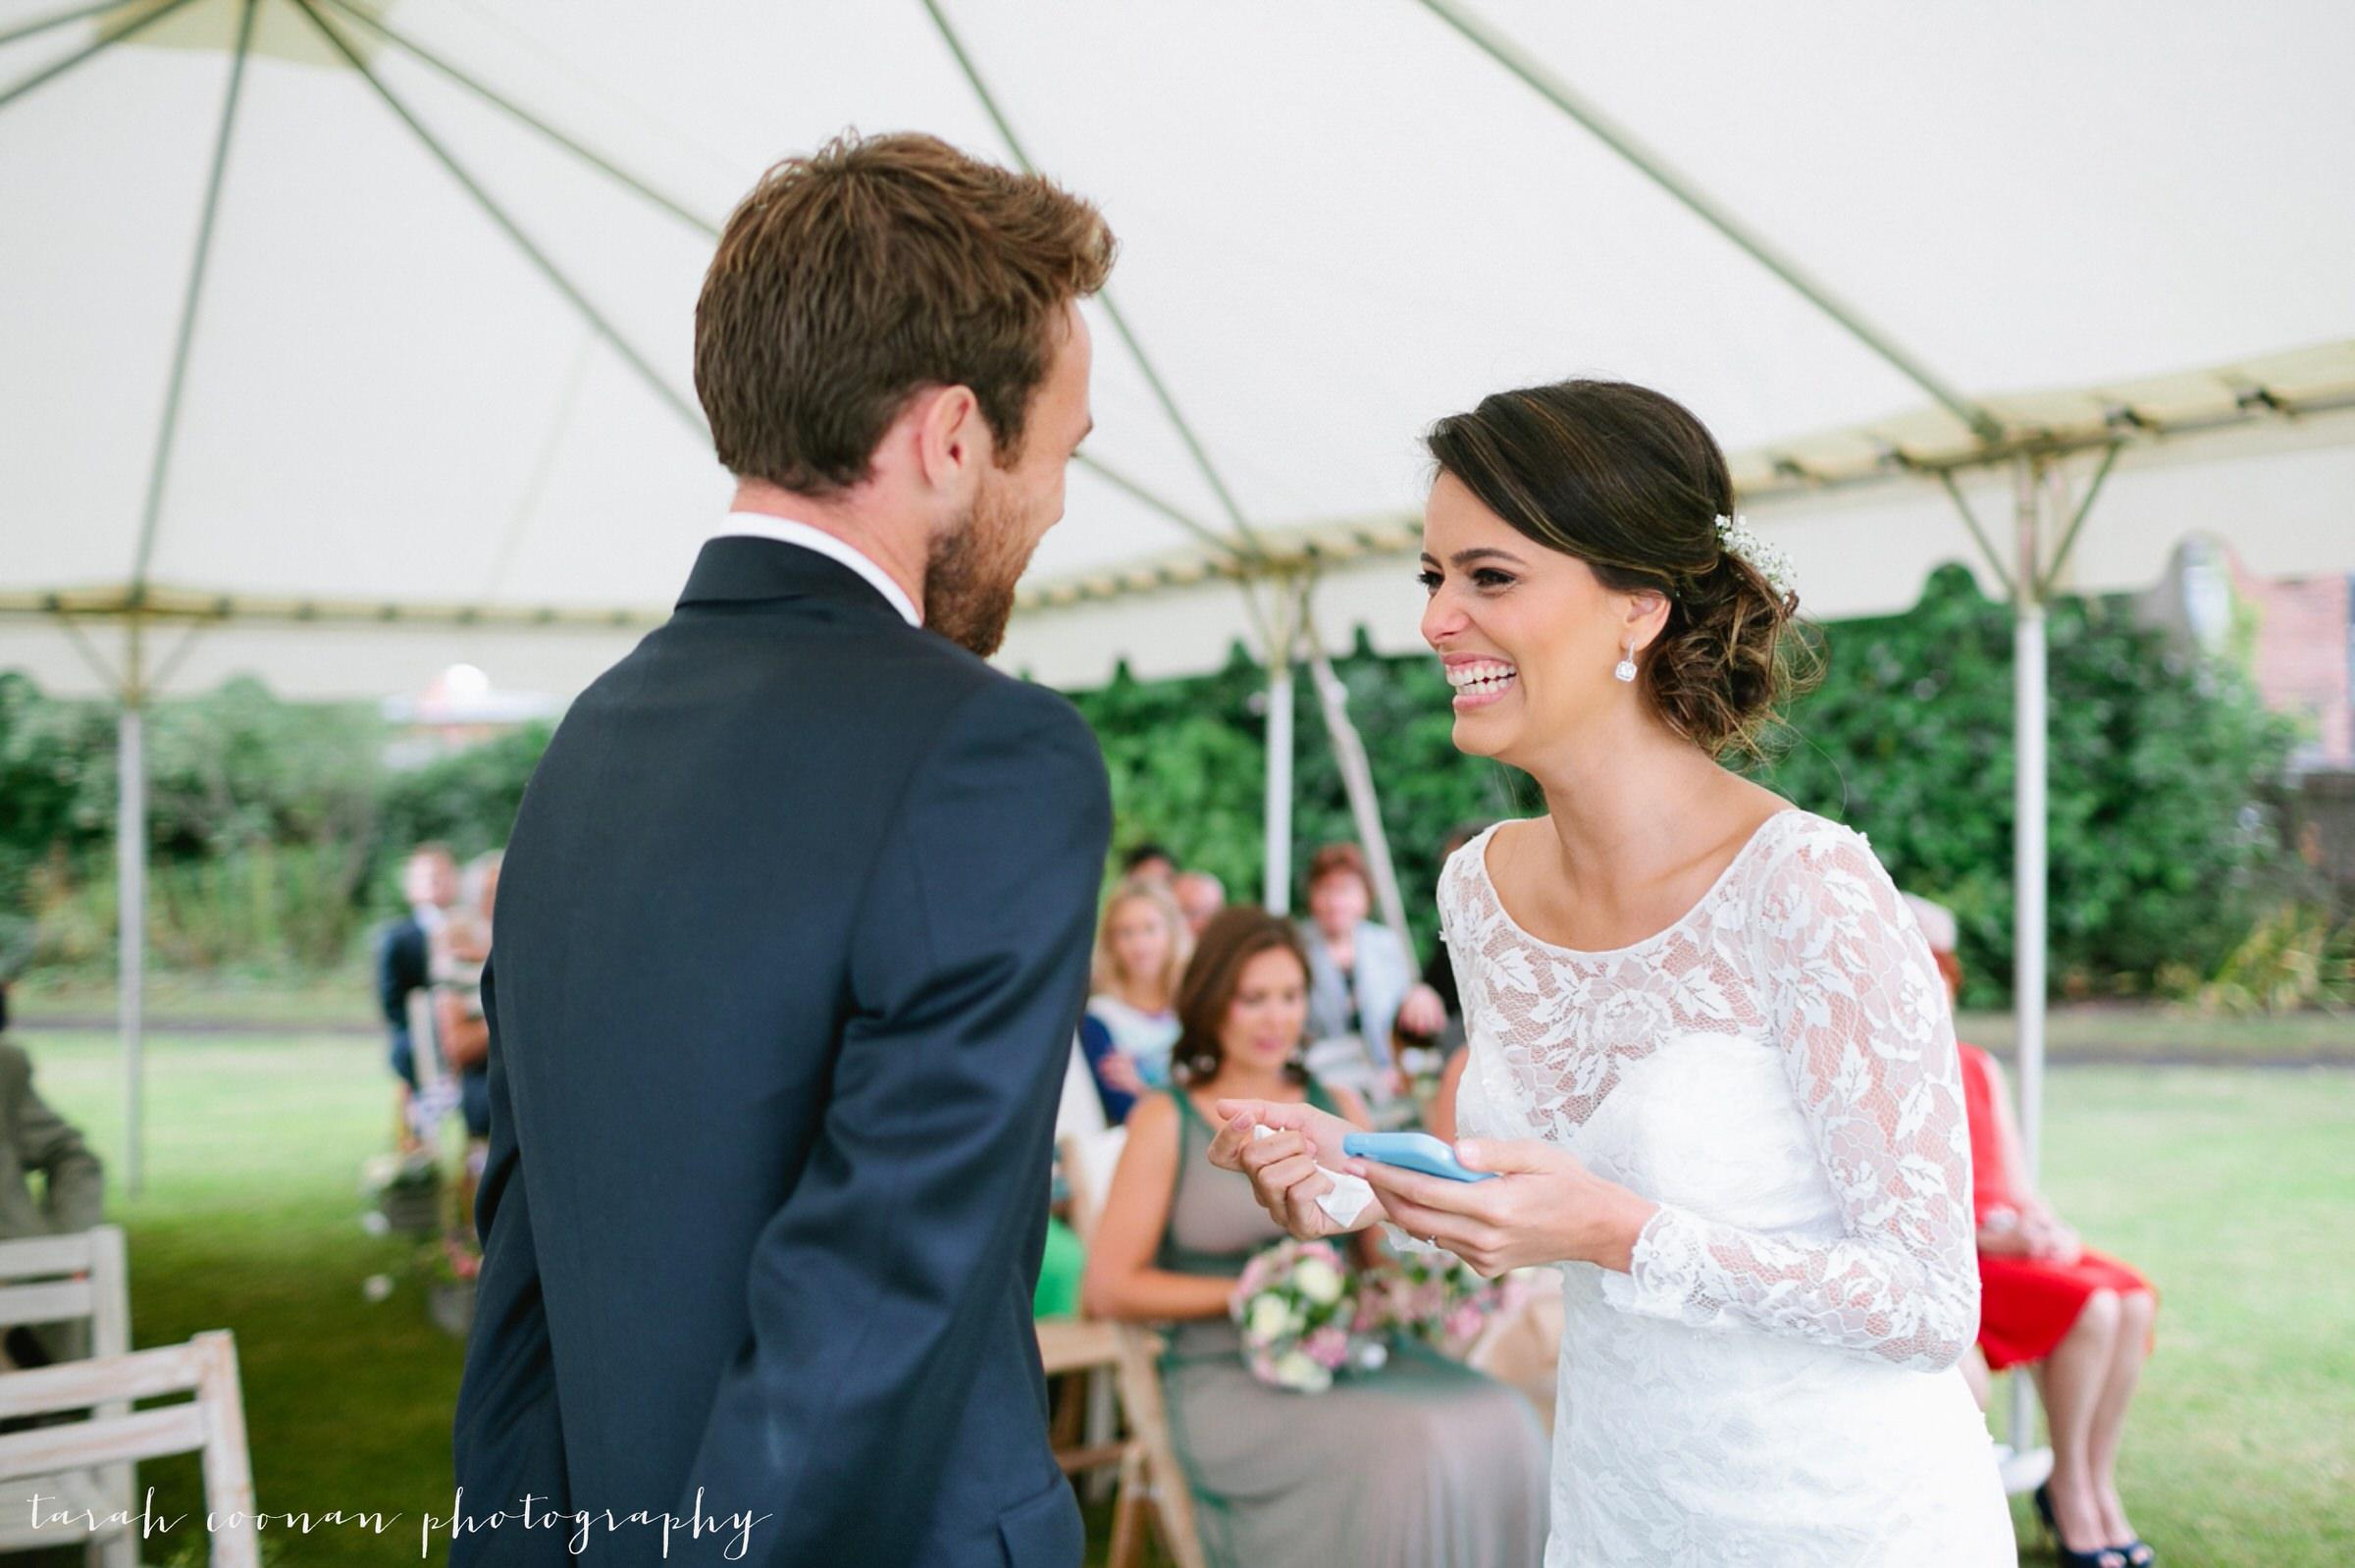 birmingham-wedding-photographer_035